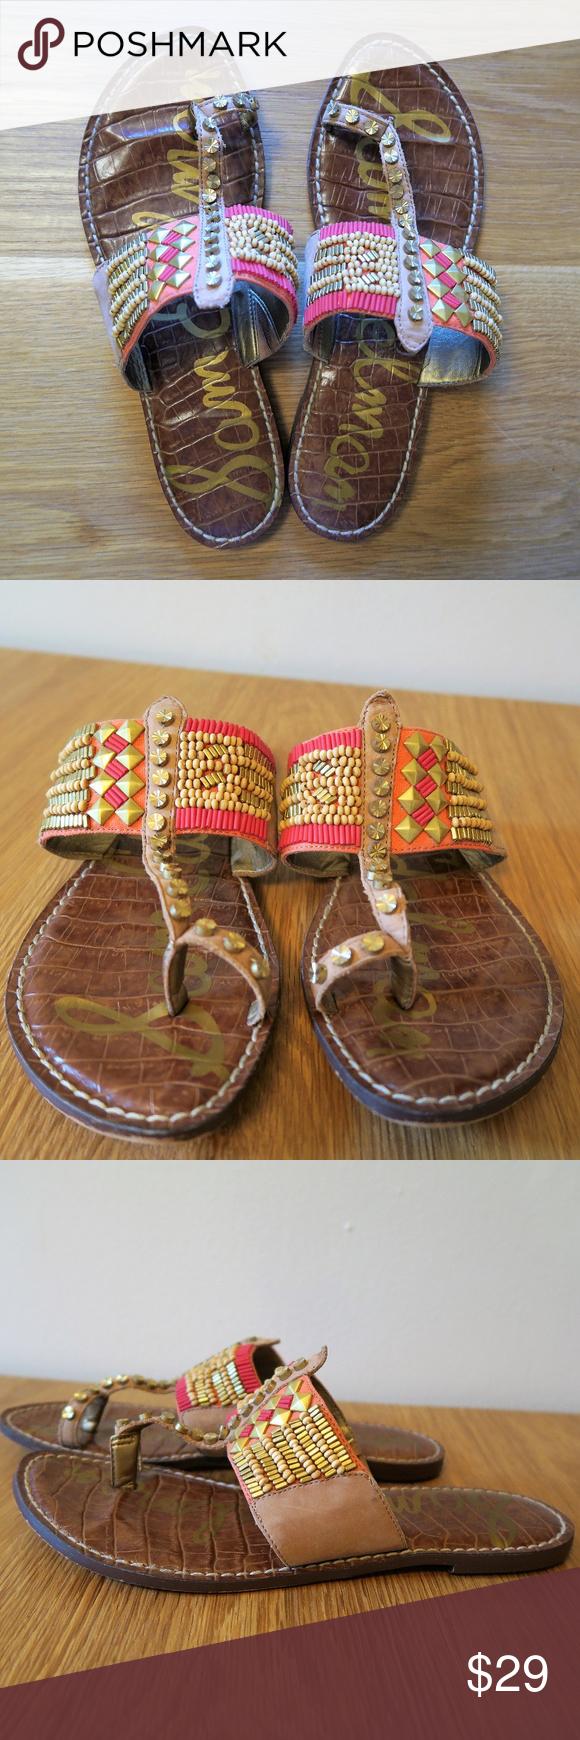 caefbdb63c64  Sam Edelman  Gideon Beaded Sandals 7.5 M Sam Edelman Gideon Beaded Sandals  Size 7.5